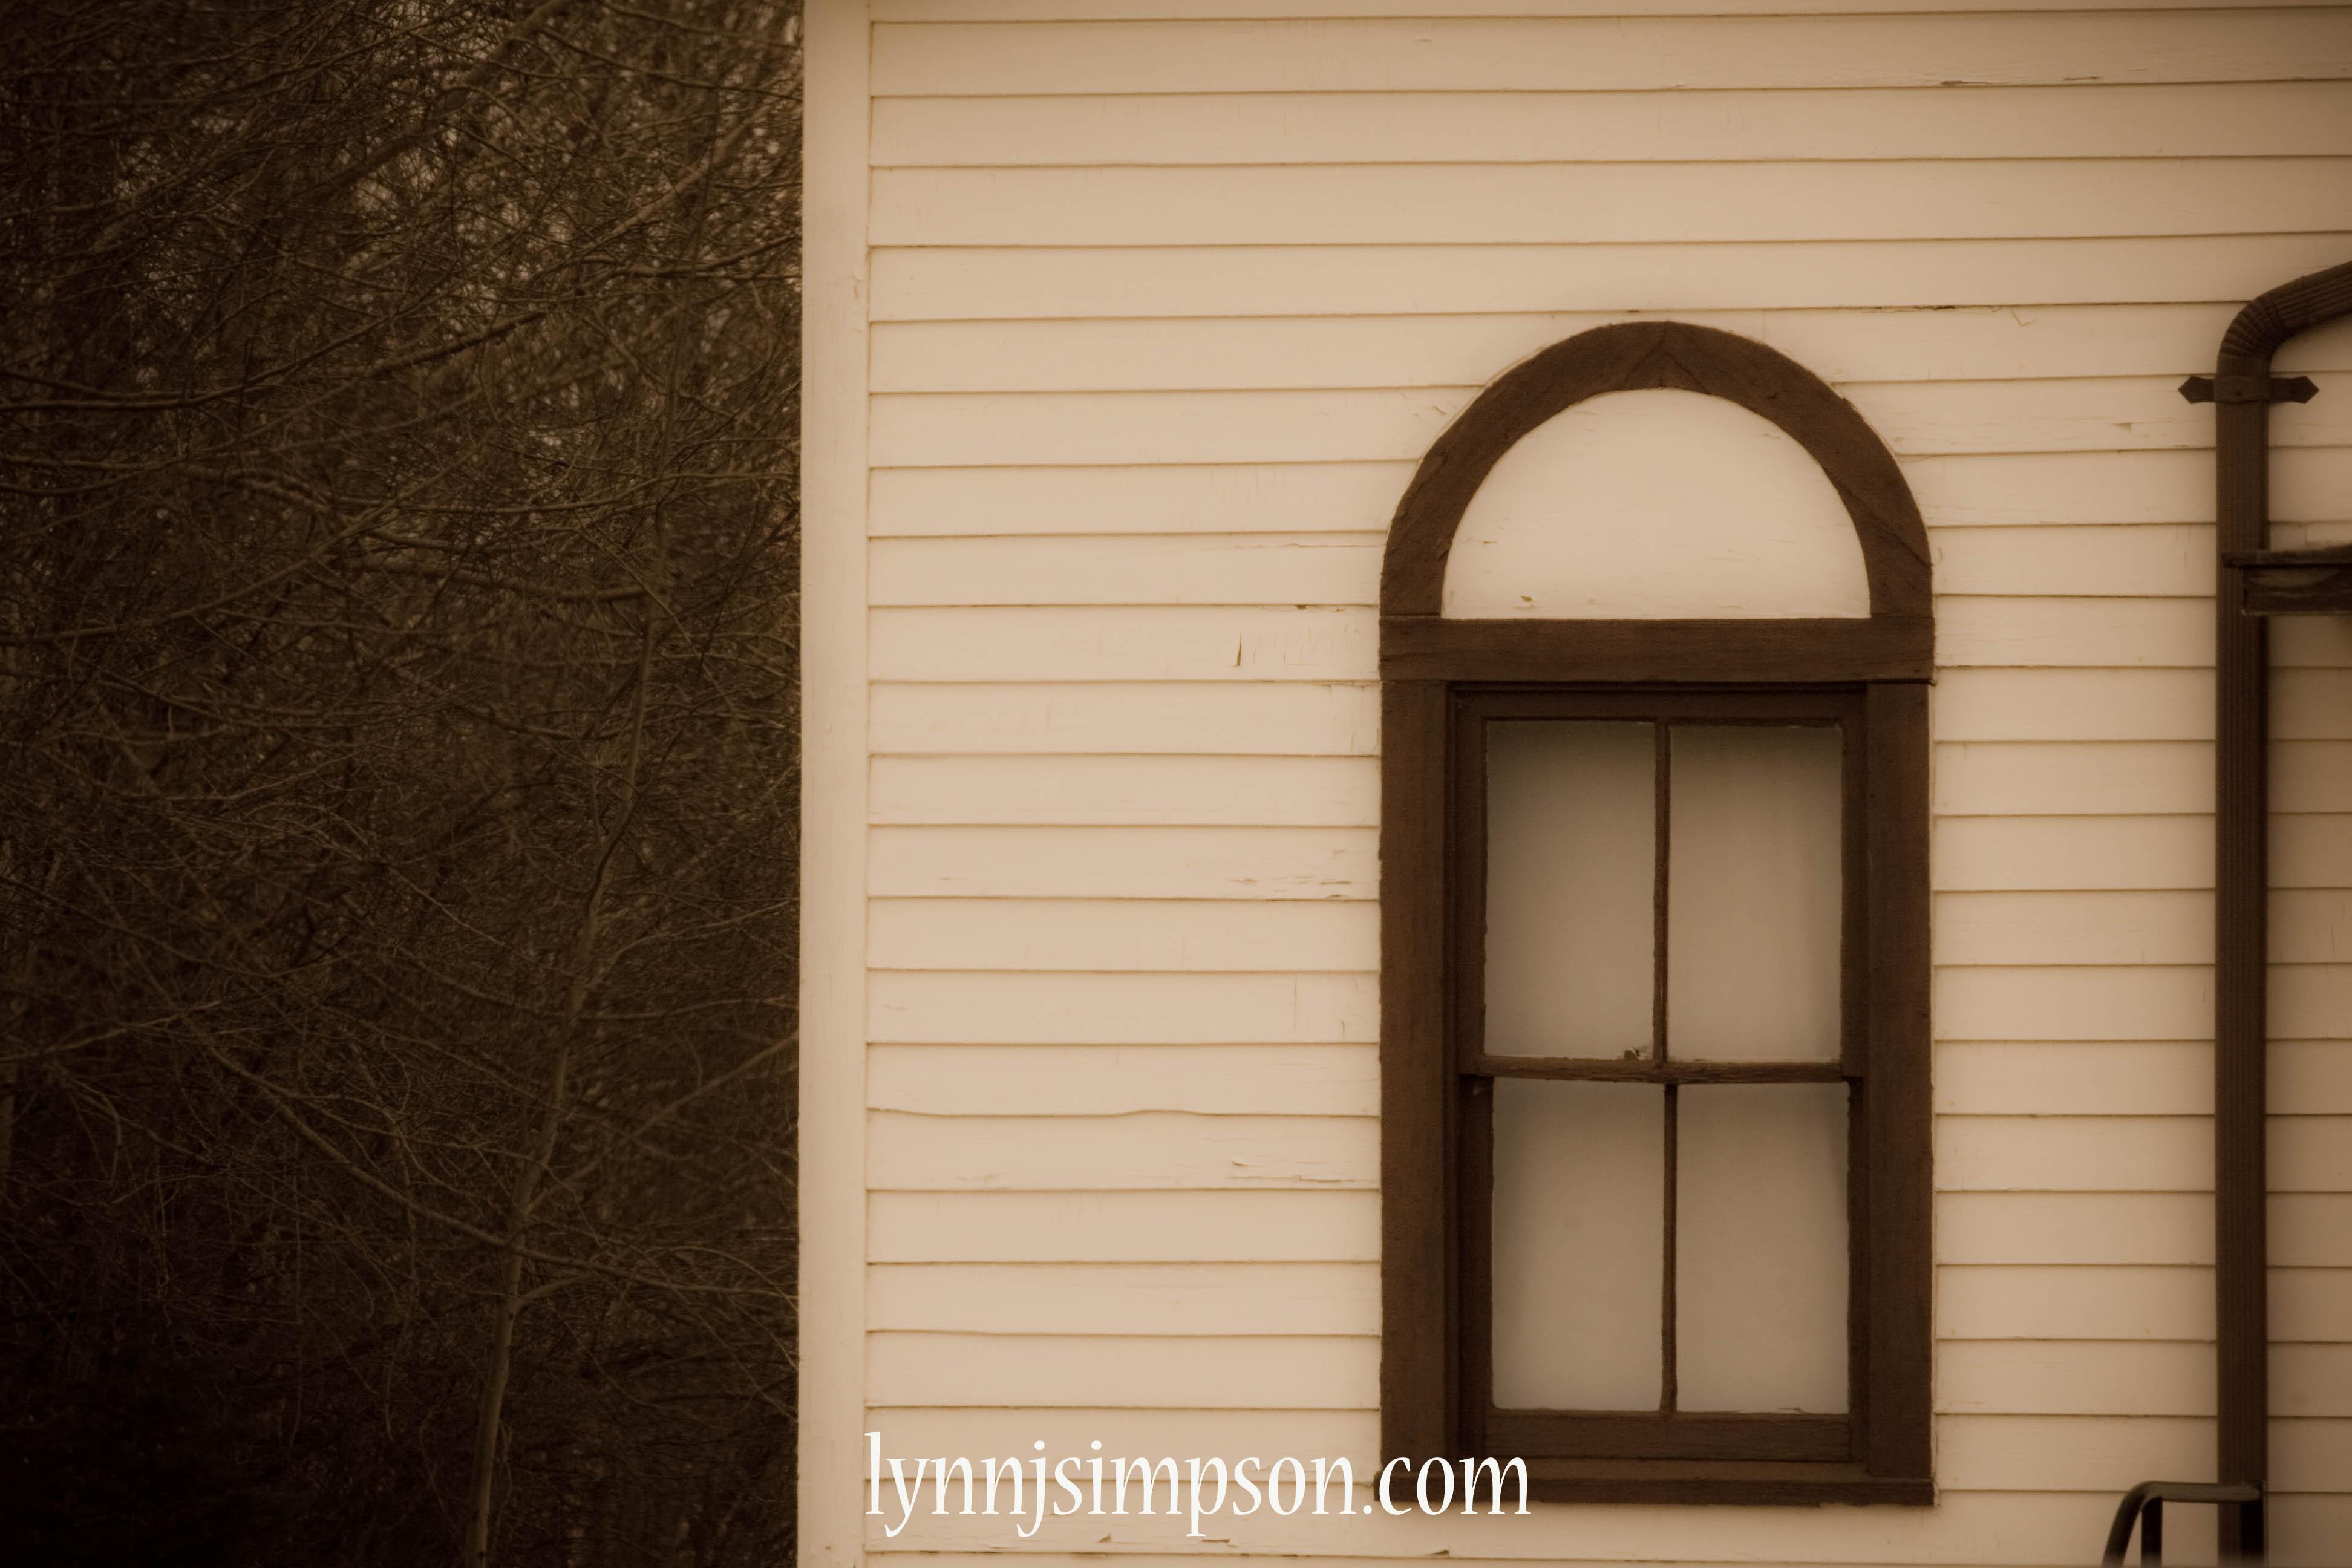 church-window-35-of-1